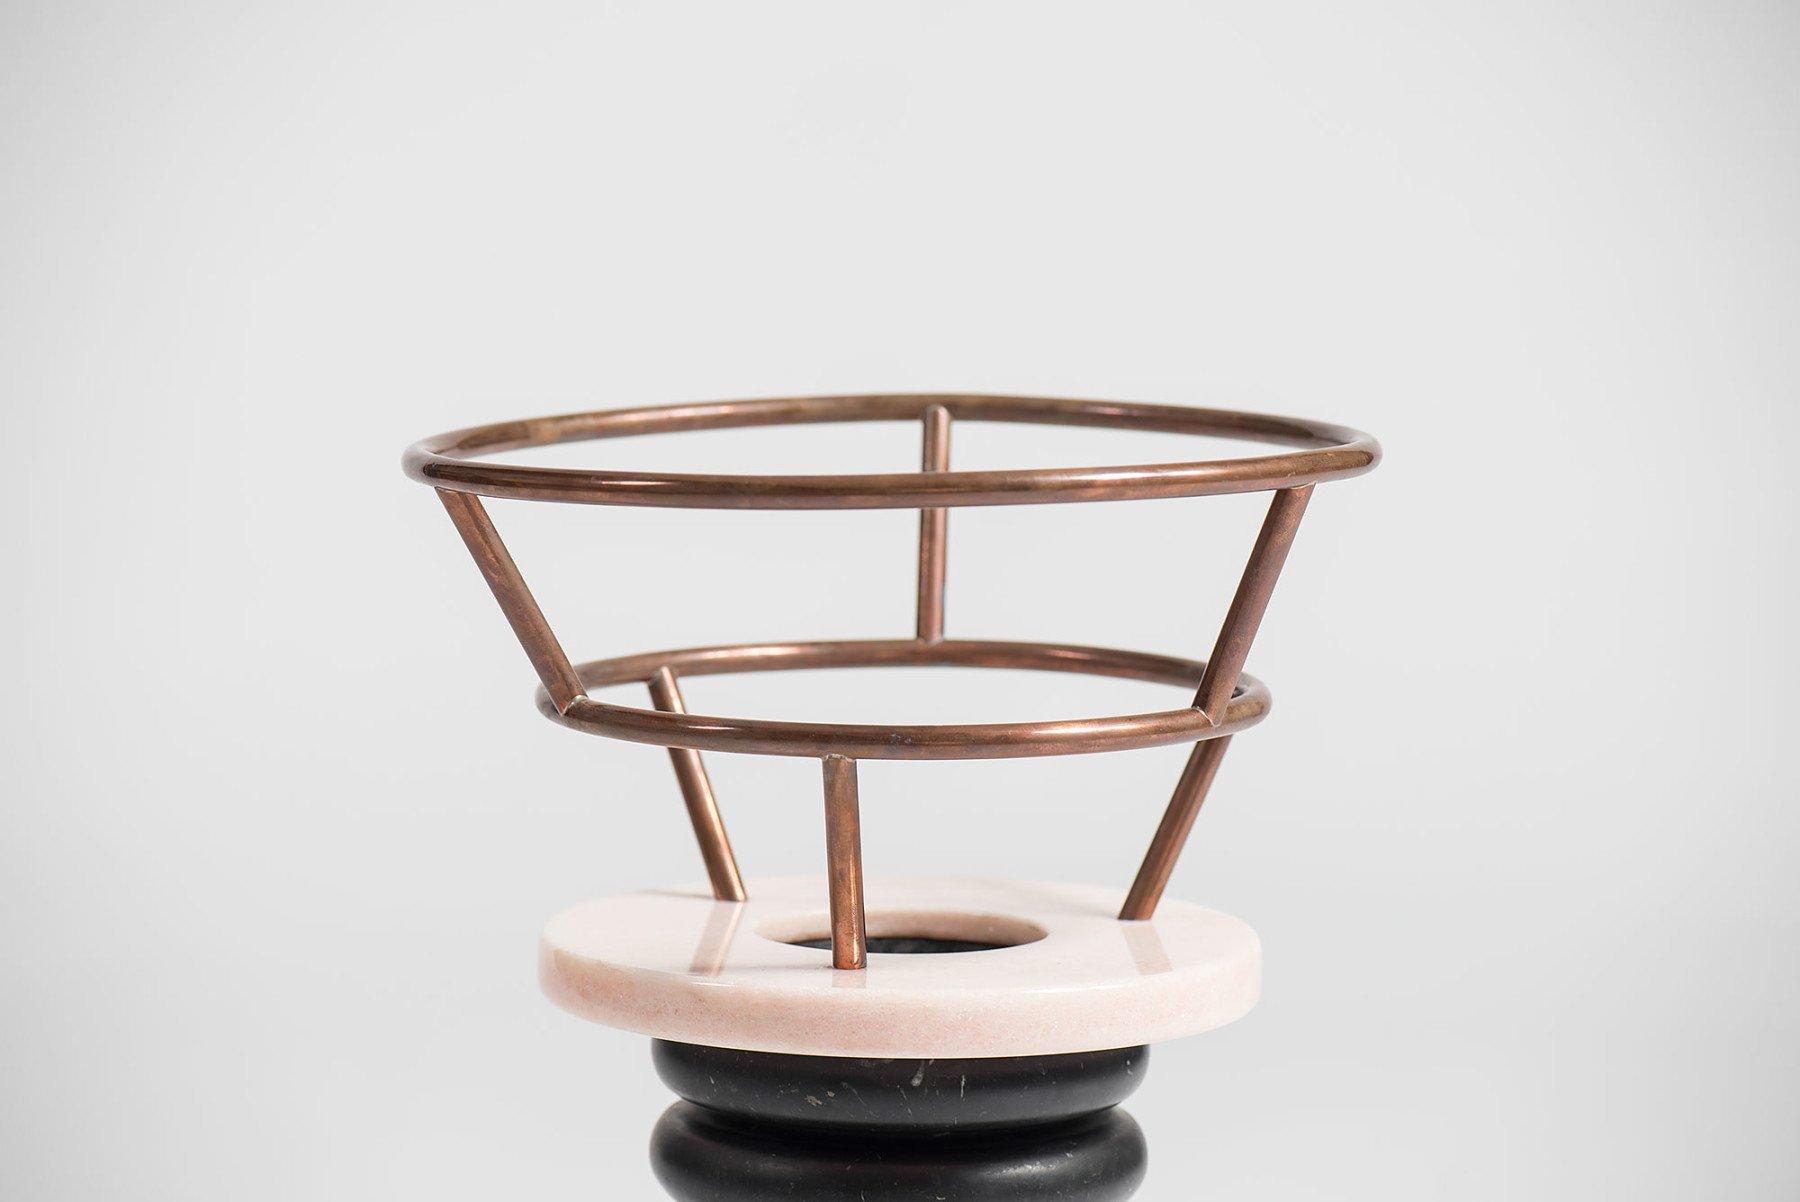 Ettore Sottsass |   Ringhiera Rossa vase